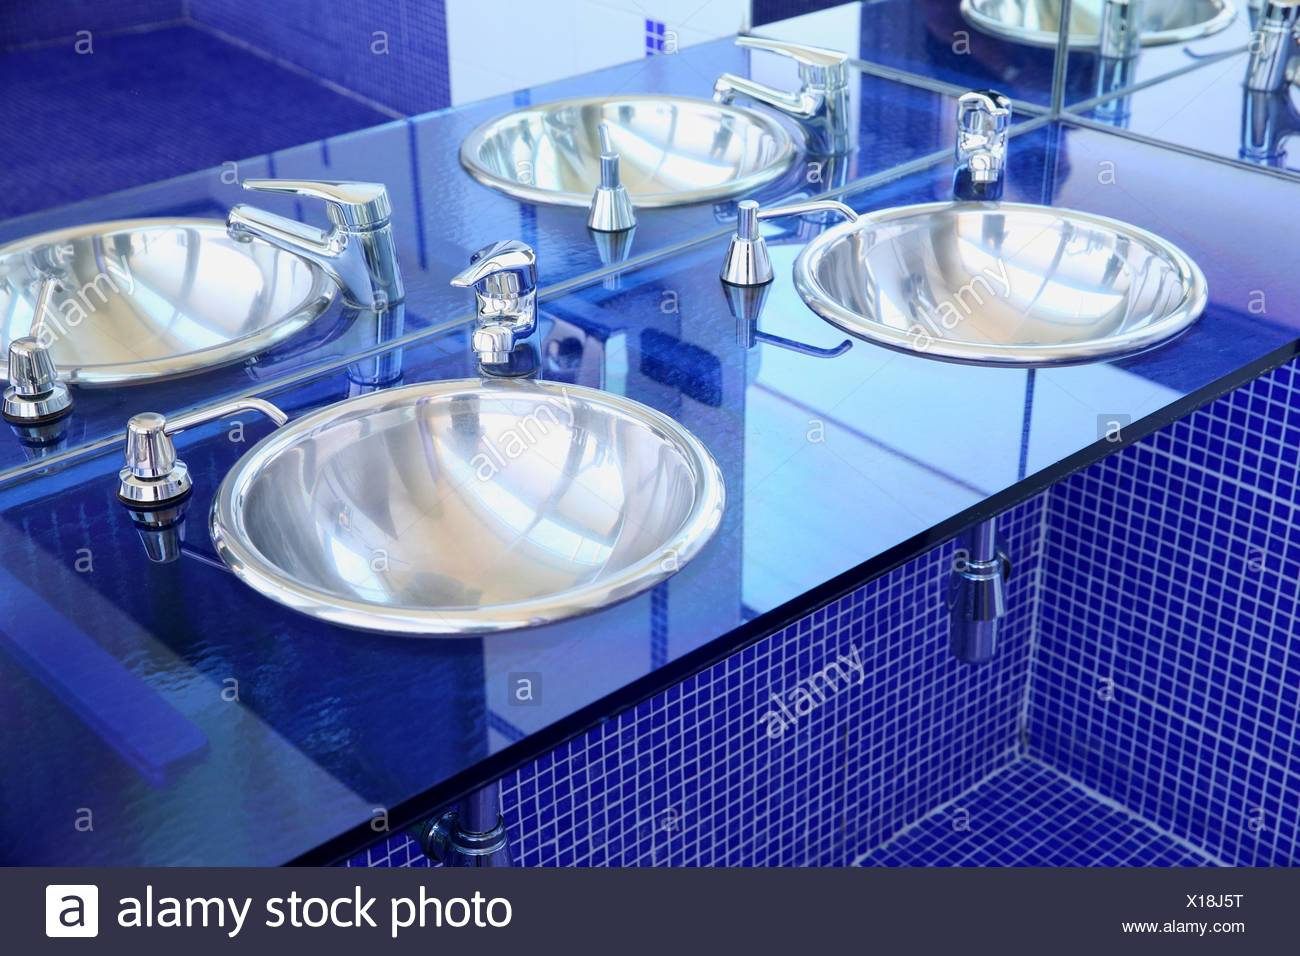 Washbasin, Sink, Toilette - Stock Image